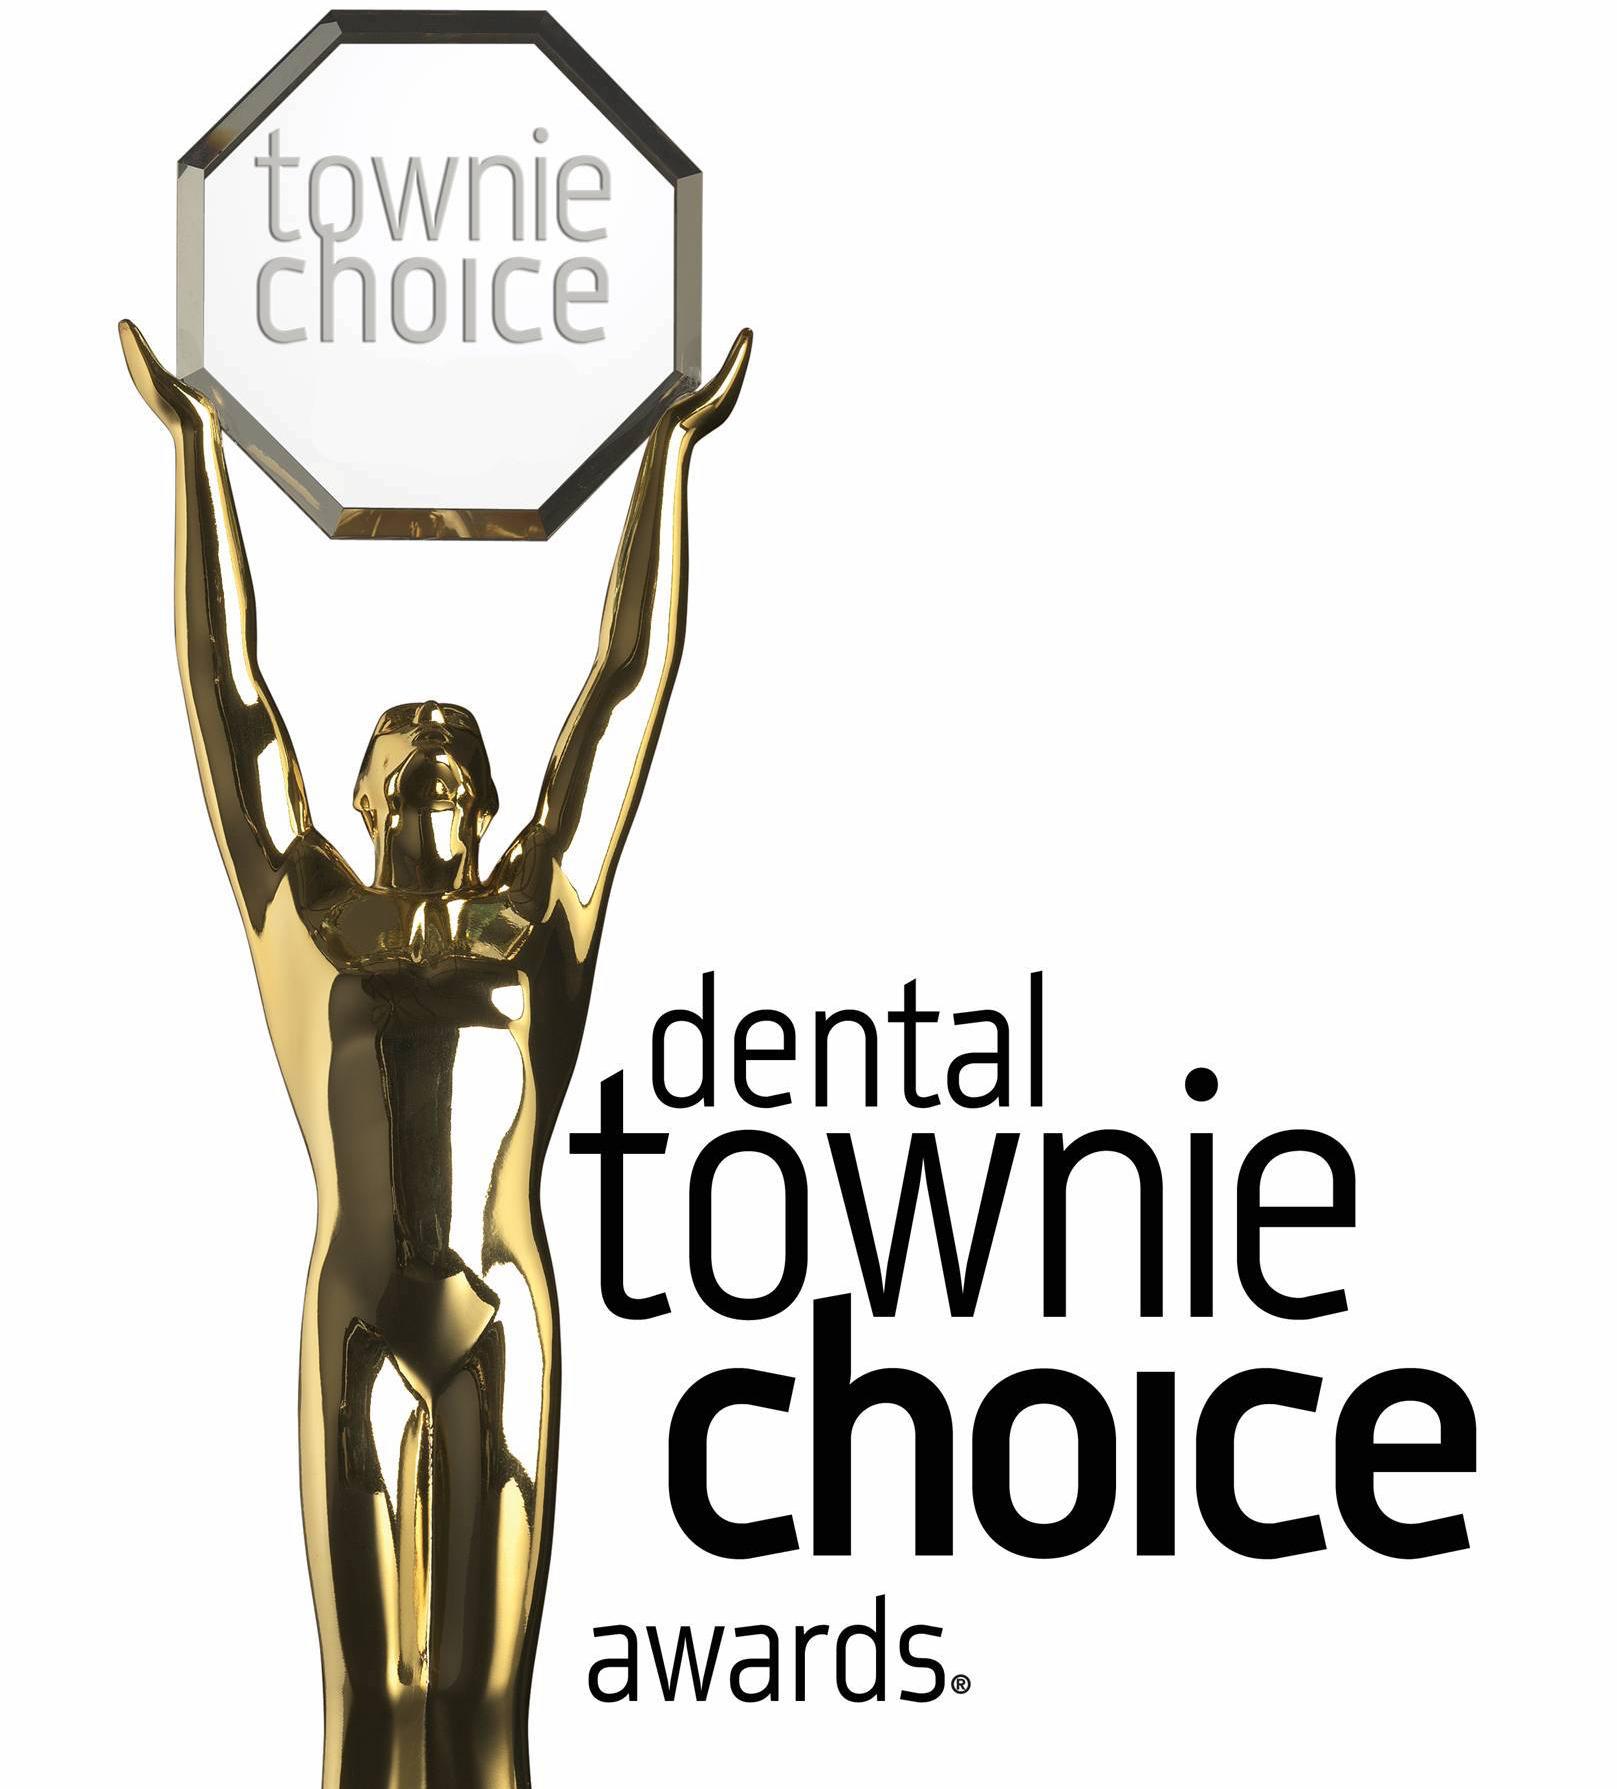 Townie award for Ultra Light Optics